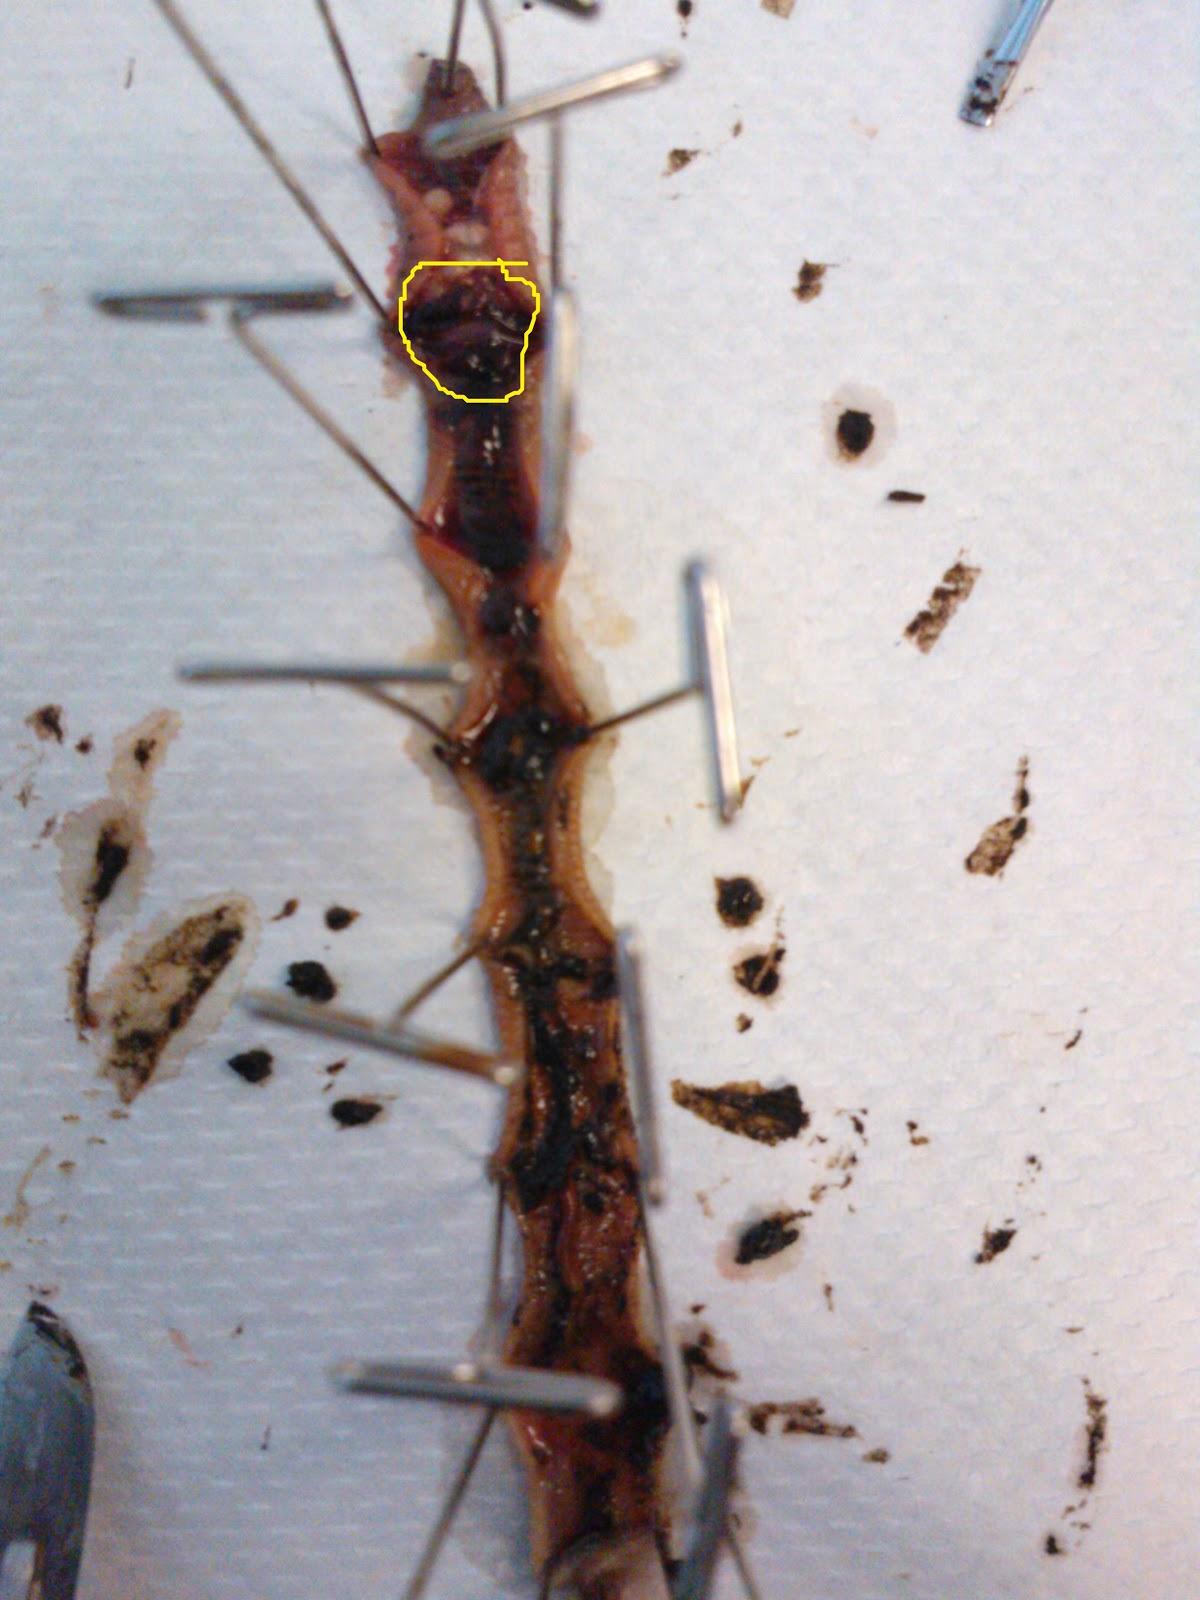 Bio11 Earthworm Dissection Lab